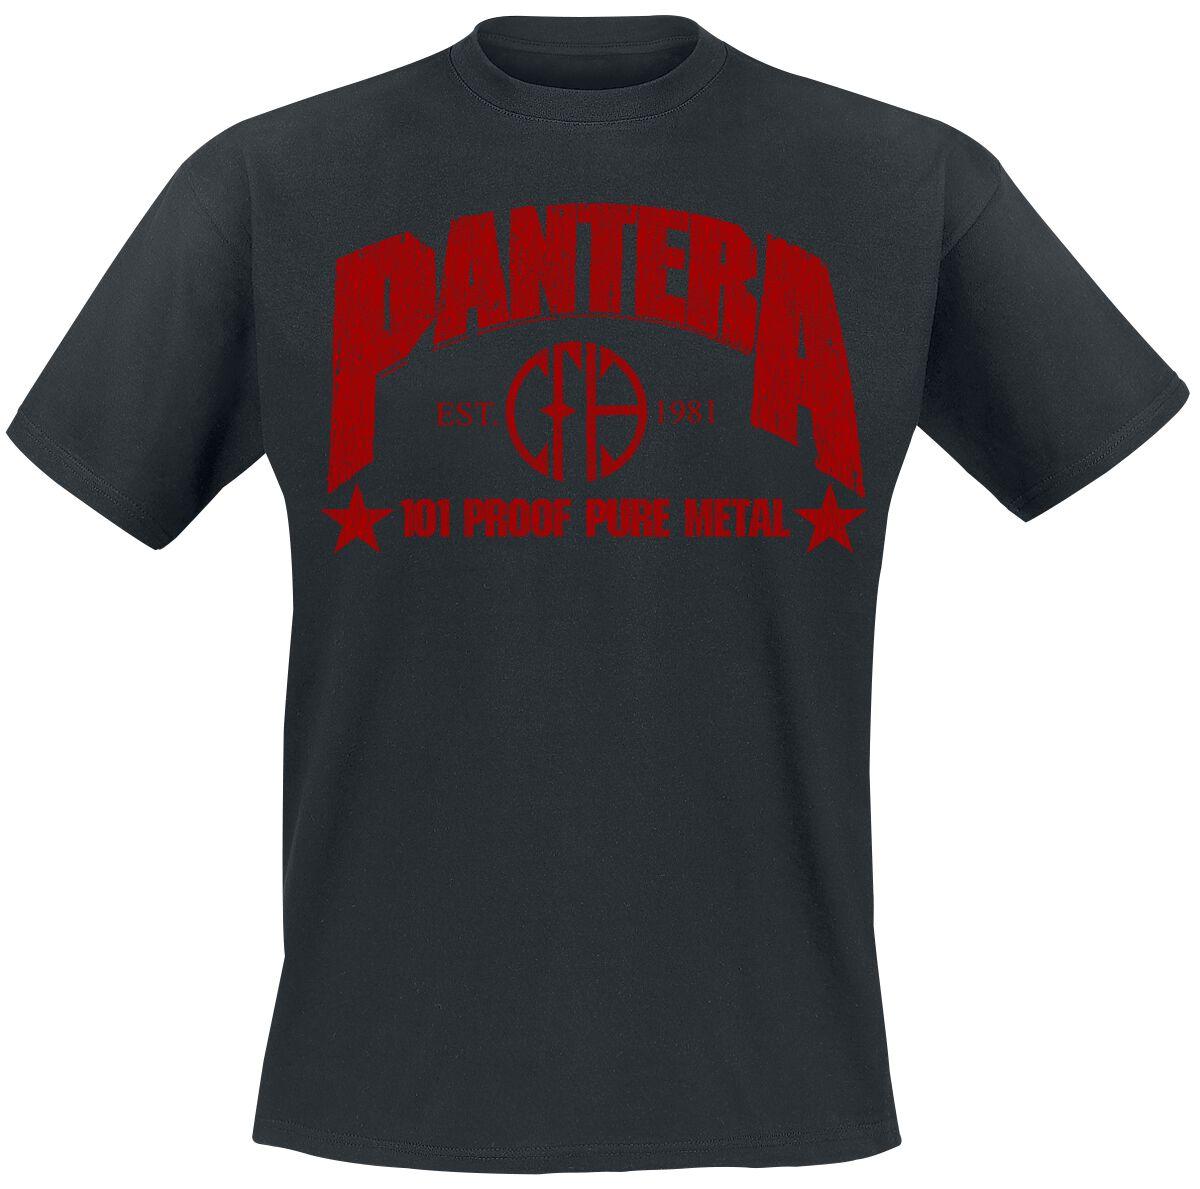 Zespoły - Koszulki - T-Shirt Pantera 101 Proof Pure Metal T-Shirt czarny - 357201